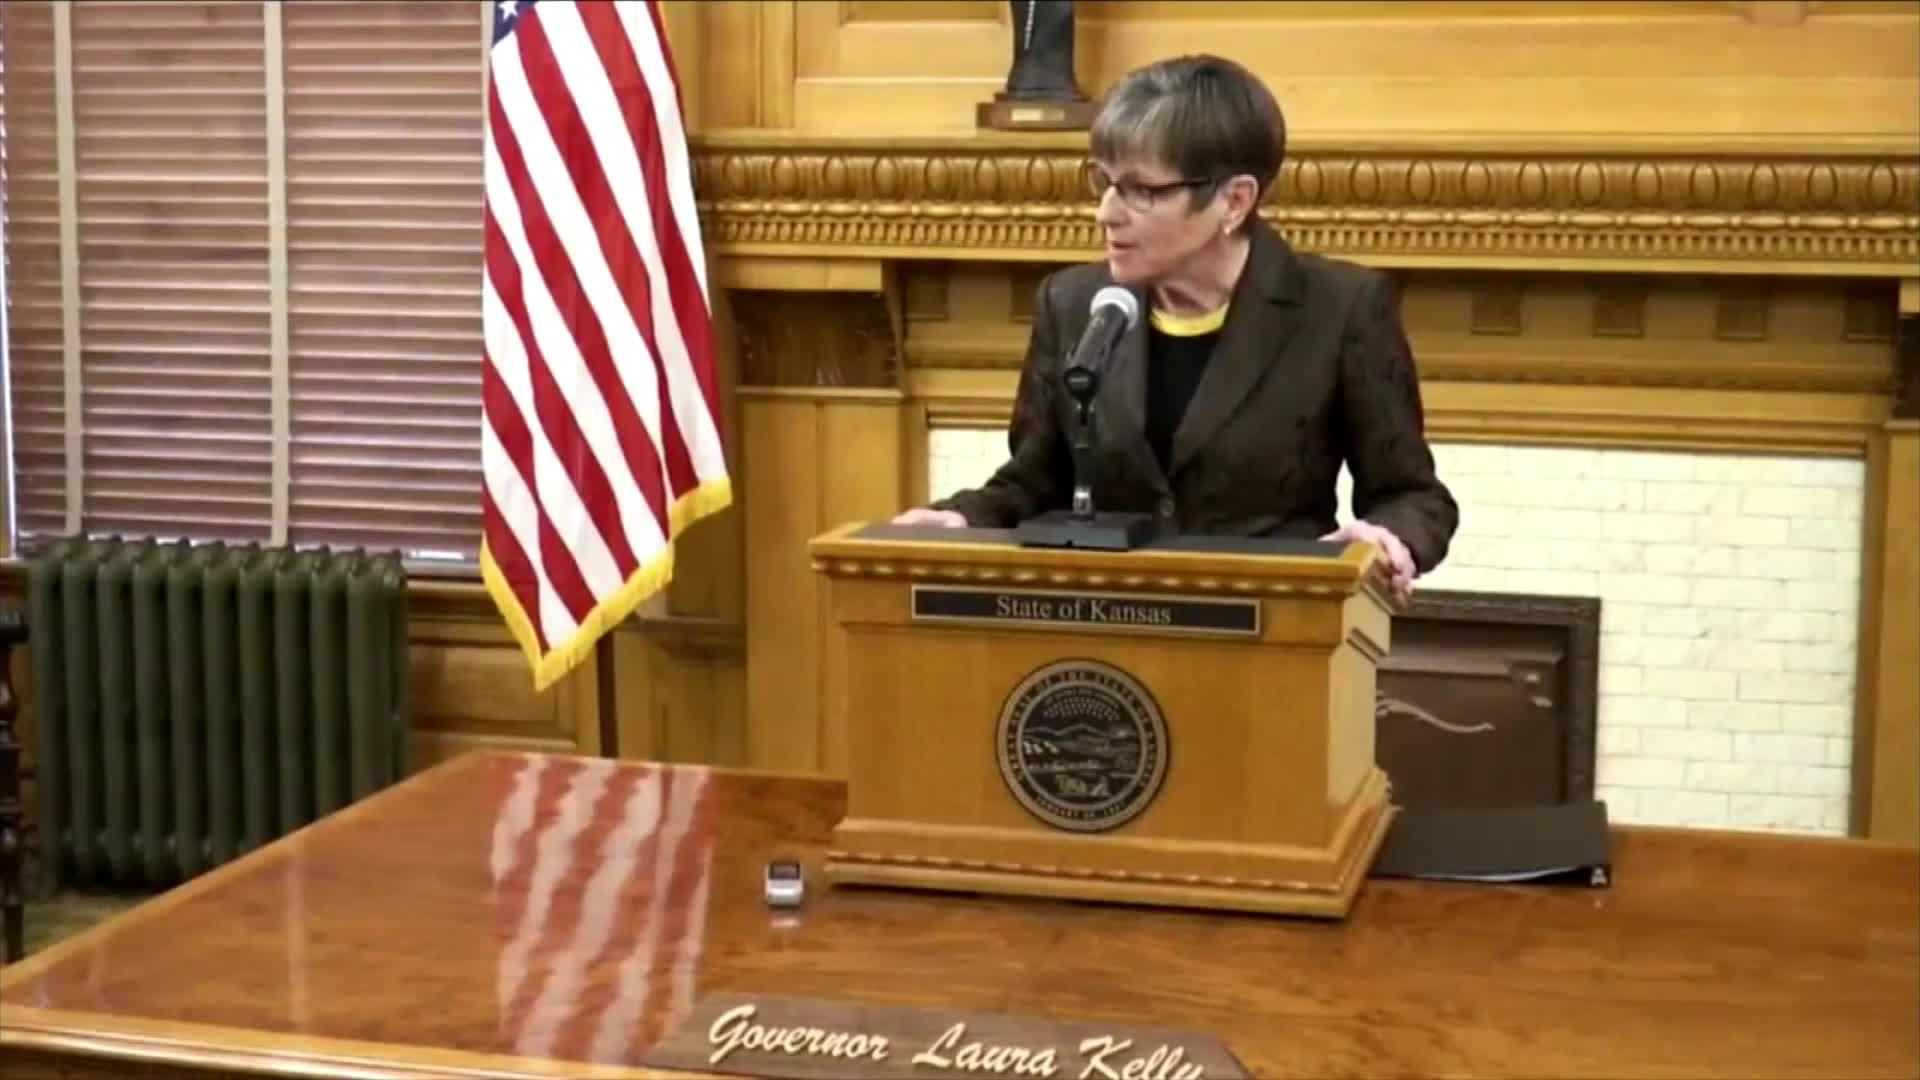 Kansas_governor_nominates_new_person_to__8_20190518033713